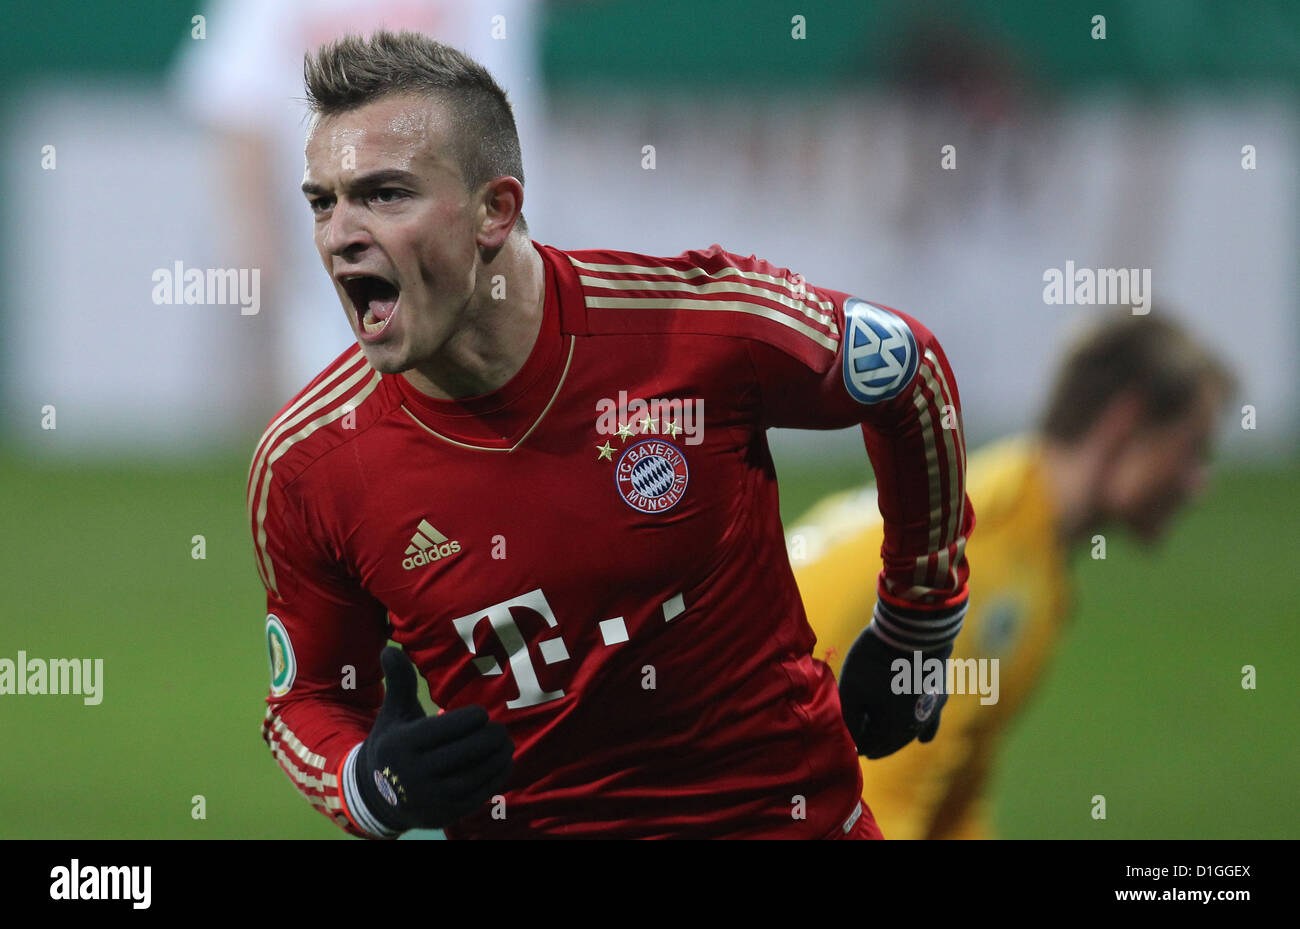 Munich's Xherdan Shaqiri celebrates his 0-2 goal during the round of the last 16 DFB Cup match between FC Augsbirg - Stock Image